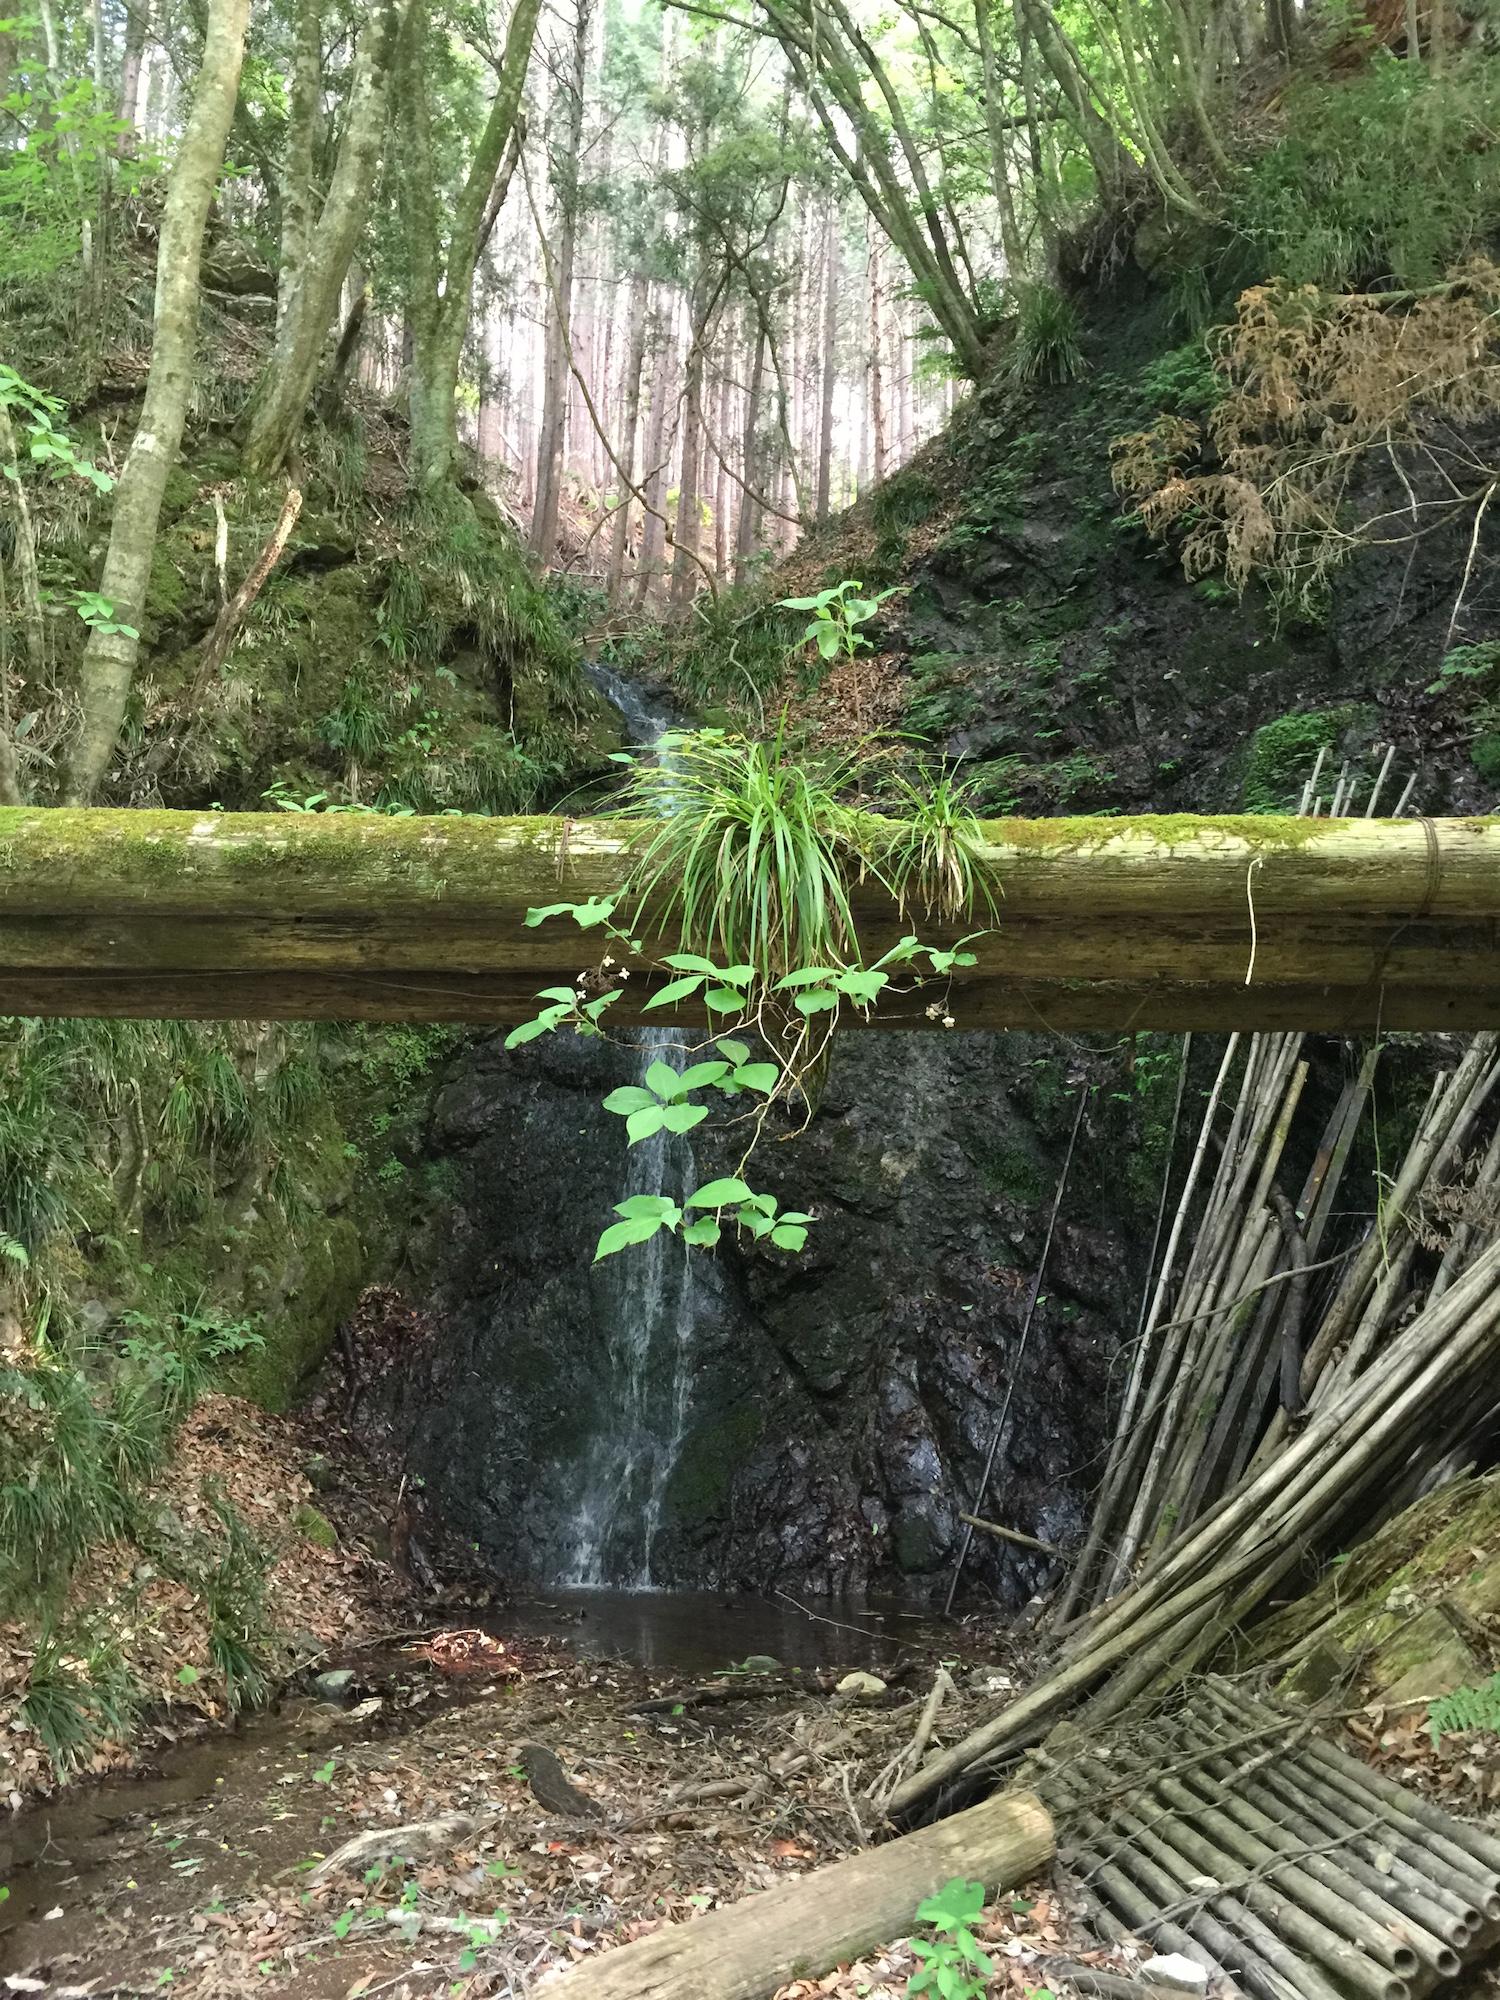 An old bamboo bridge